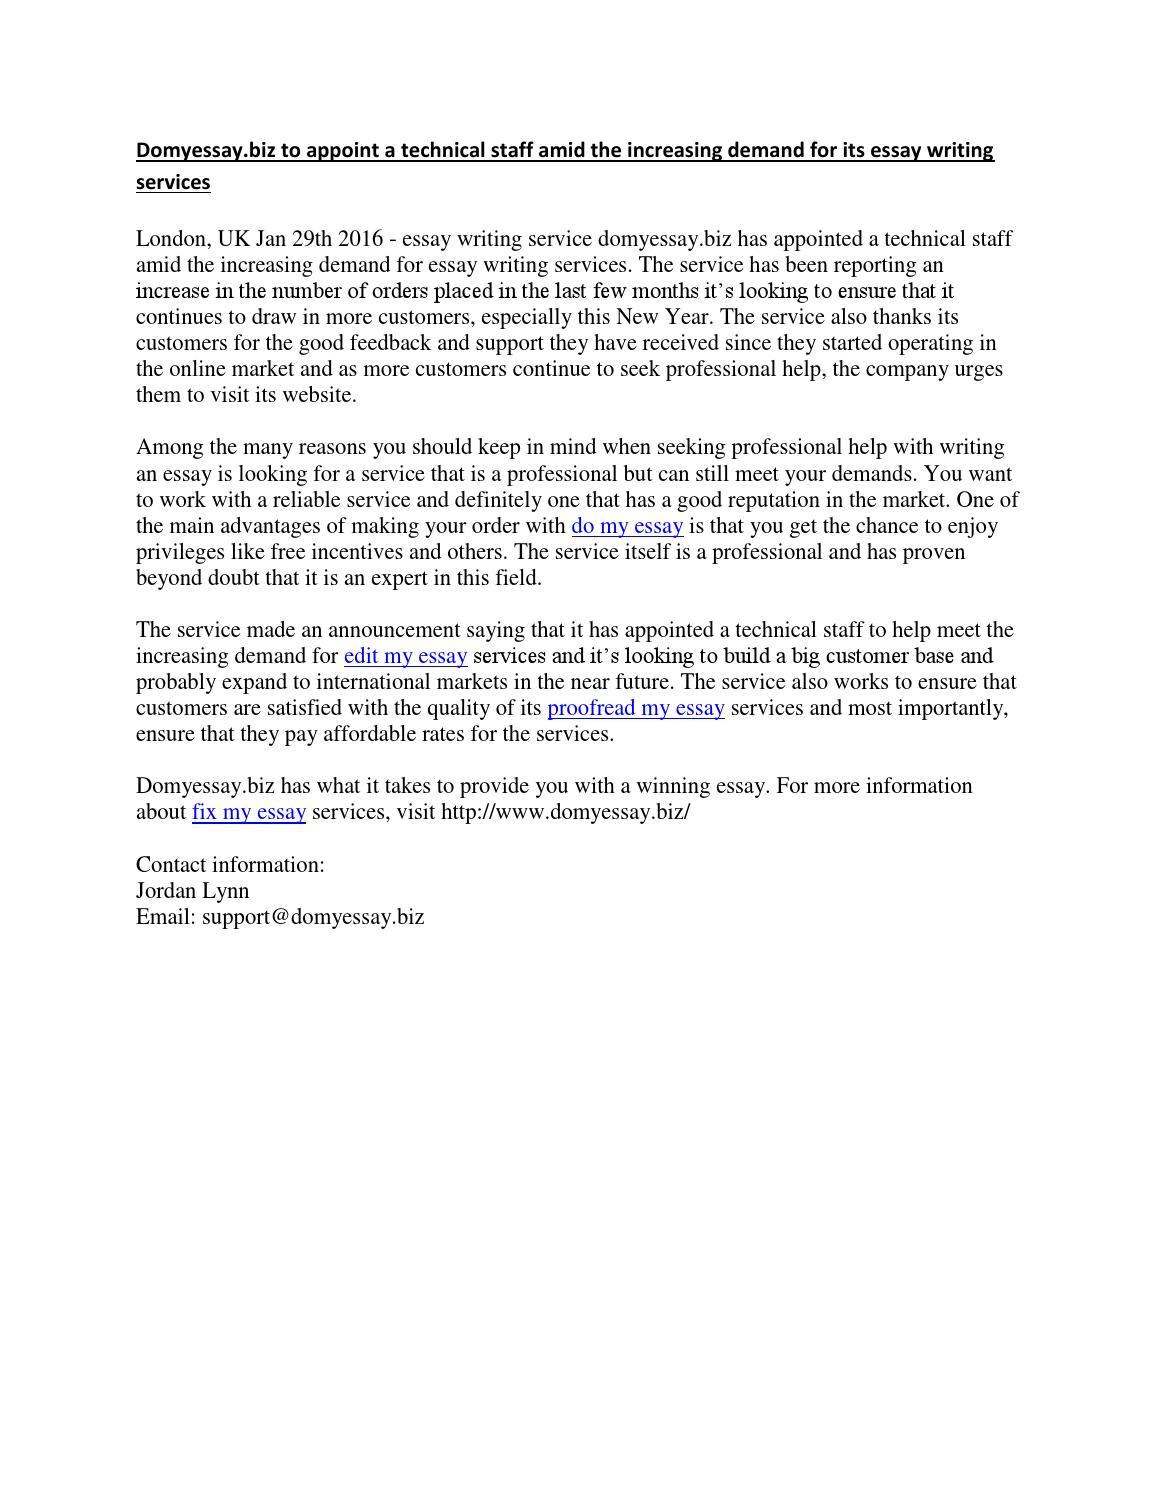 018 Essay Example Page 1 Fix Singular My College Generator Free Help Full